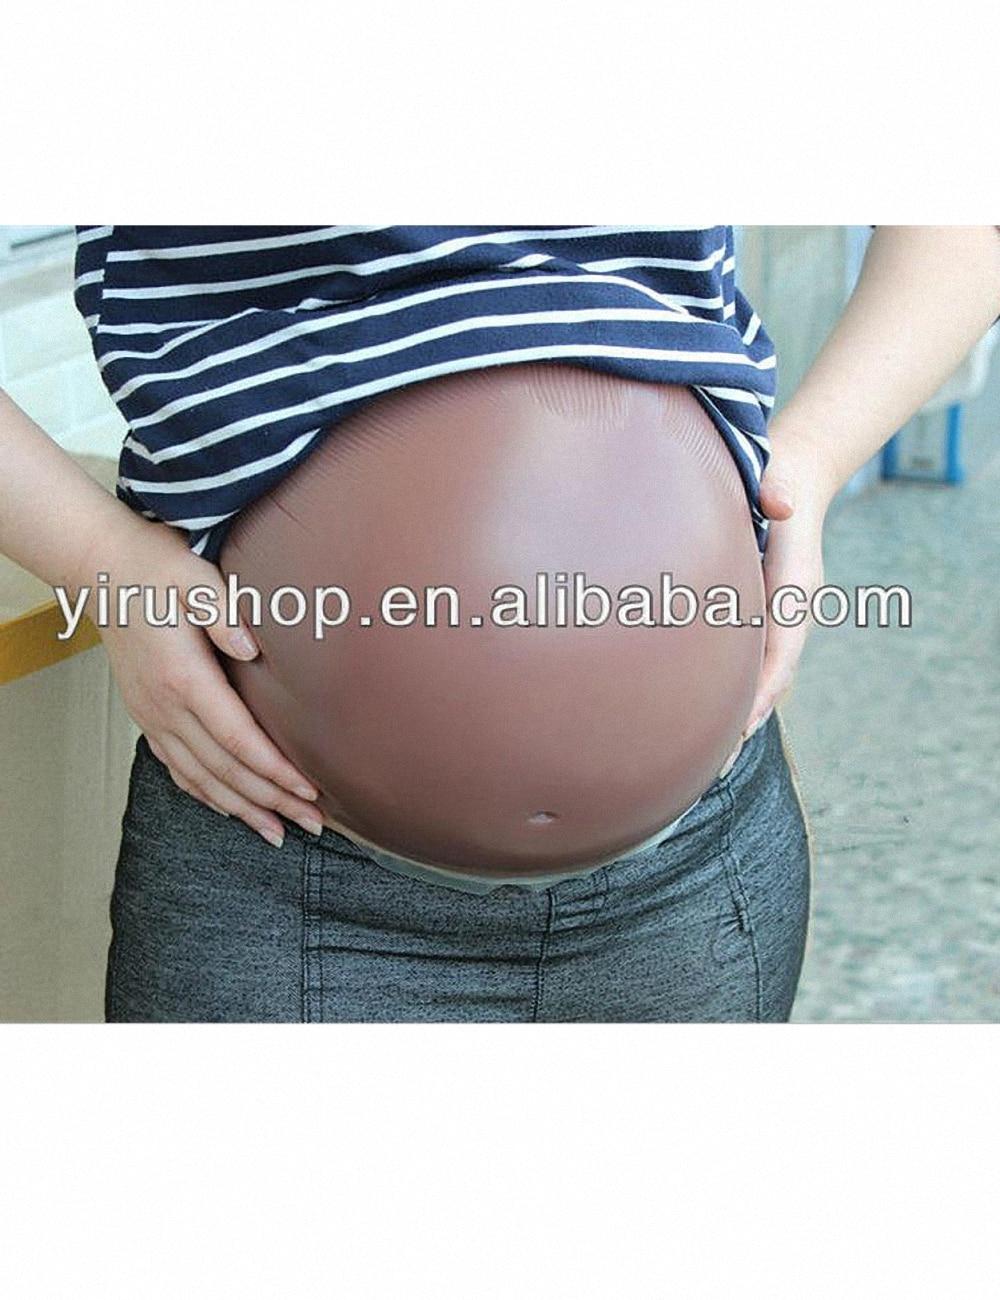 Brown 5000G  Twins Fake Silicone  Pregnancy Belly  False  Silicone Pregnancy Baby Bump  Jelly Belly  For Fake Pregnancy велосипед stinger zeta d 27 5 2015